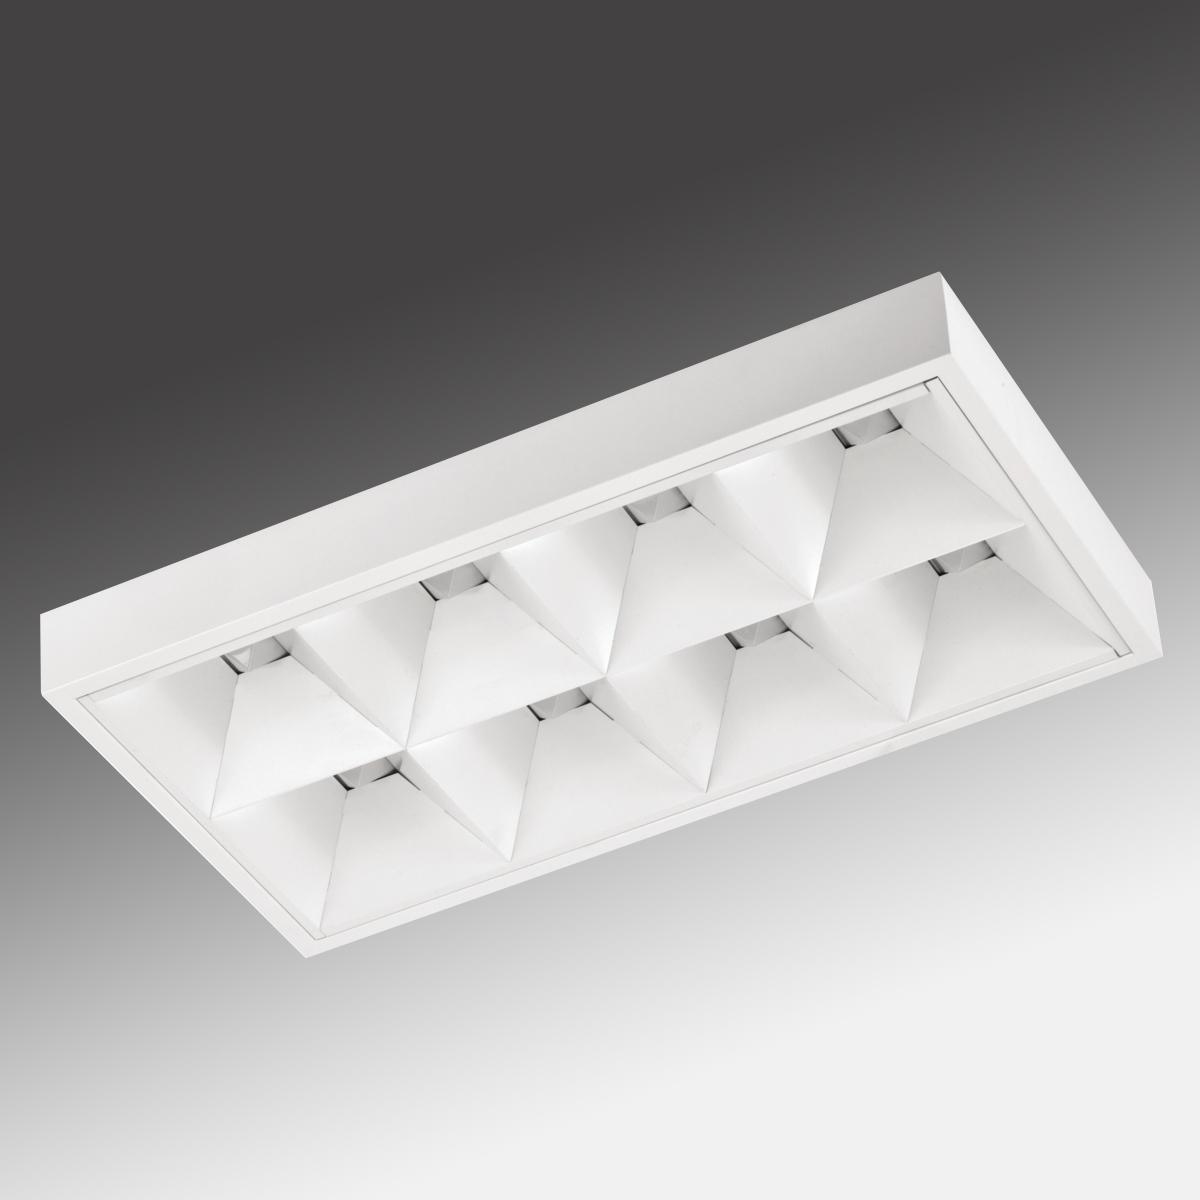 SALENA LED 29W 3050lm/840 SLB EVG IP20 weiß